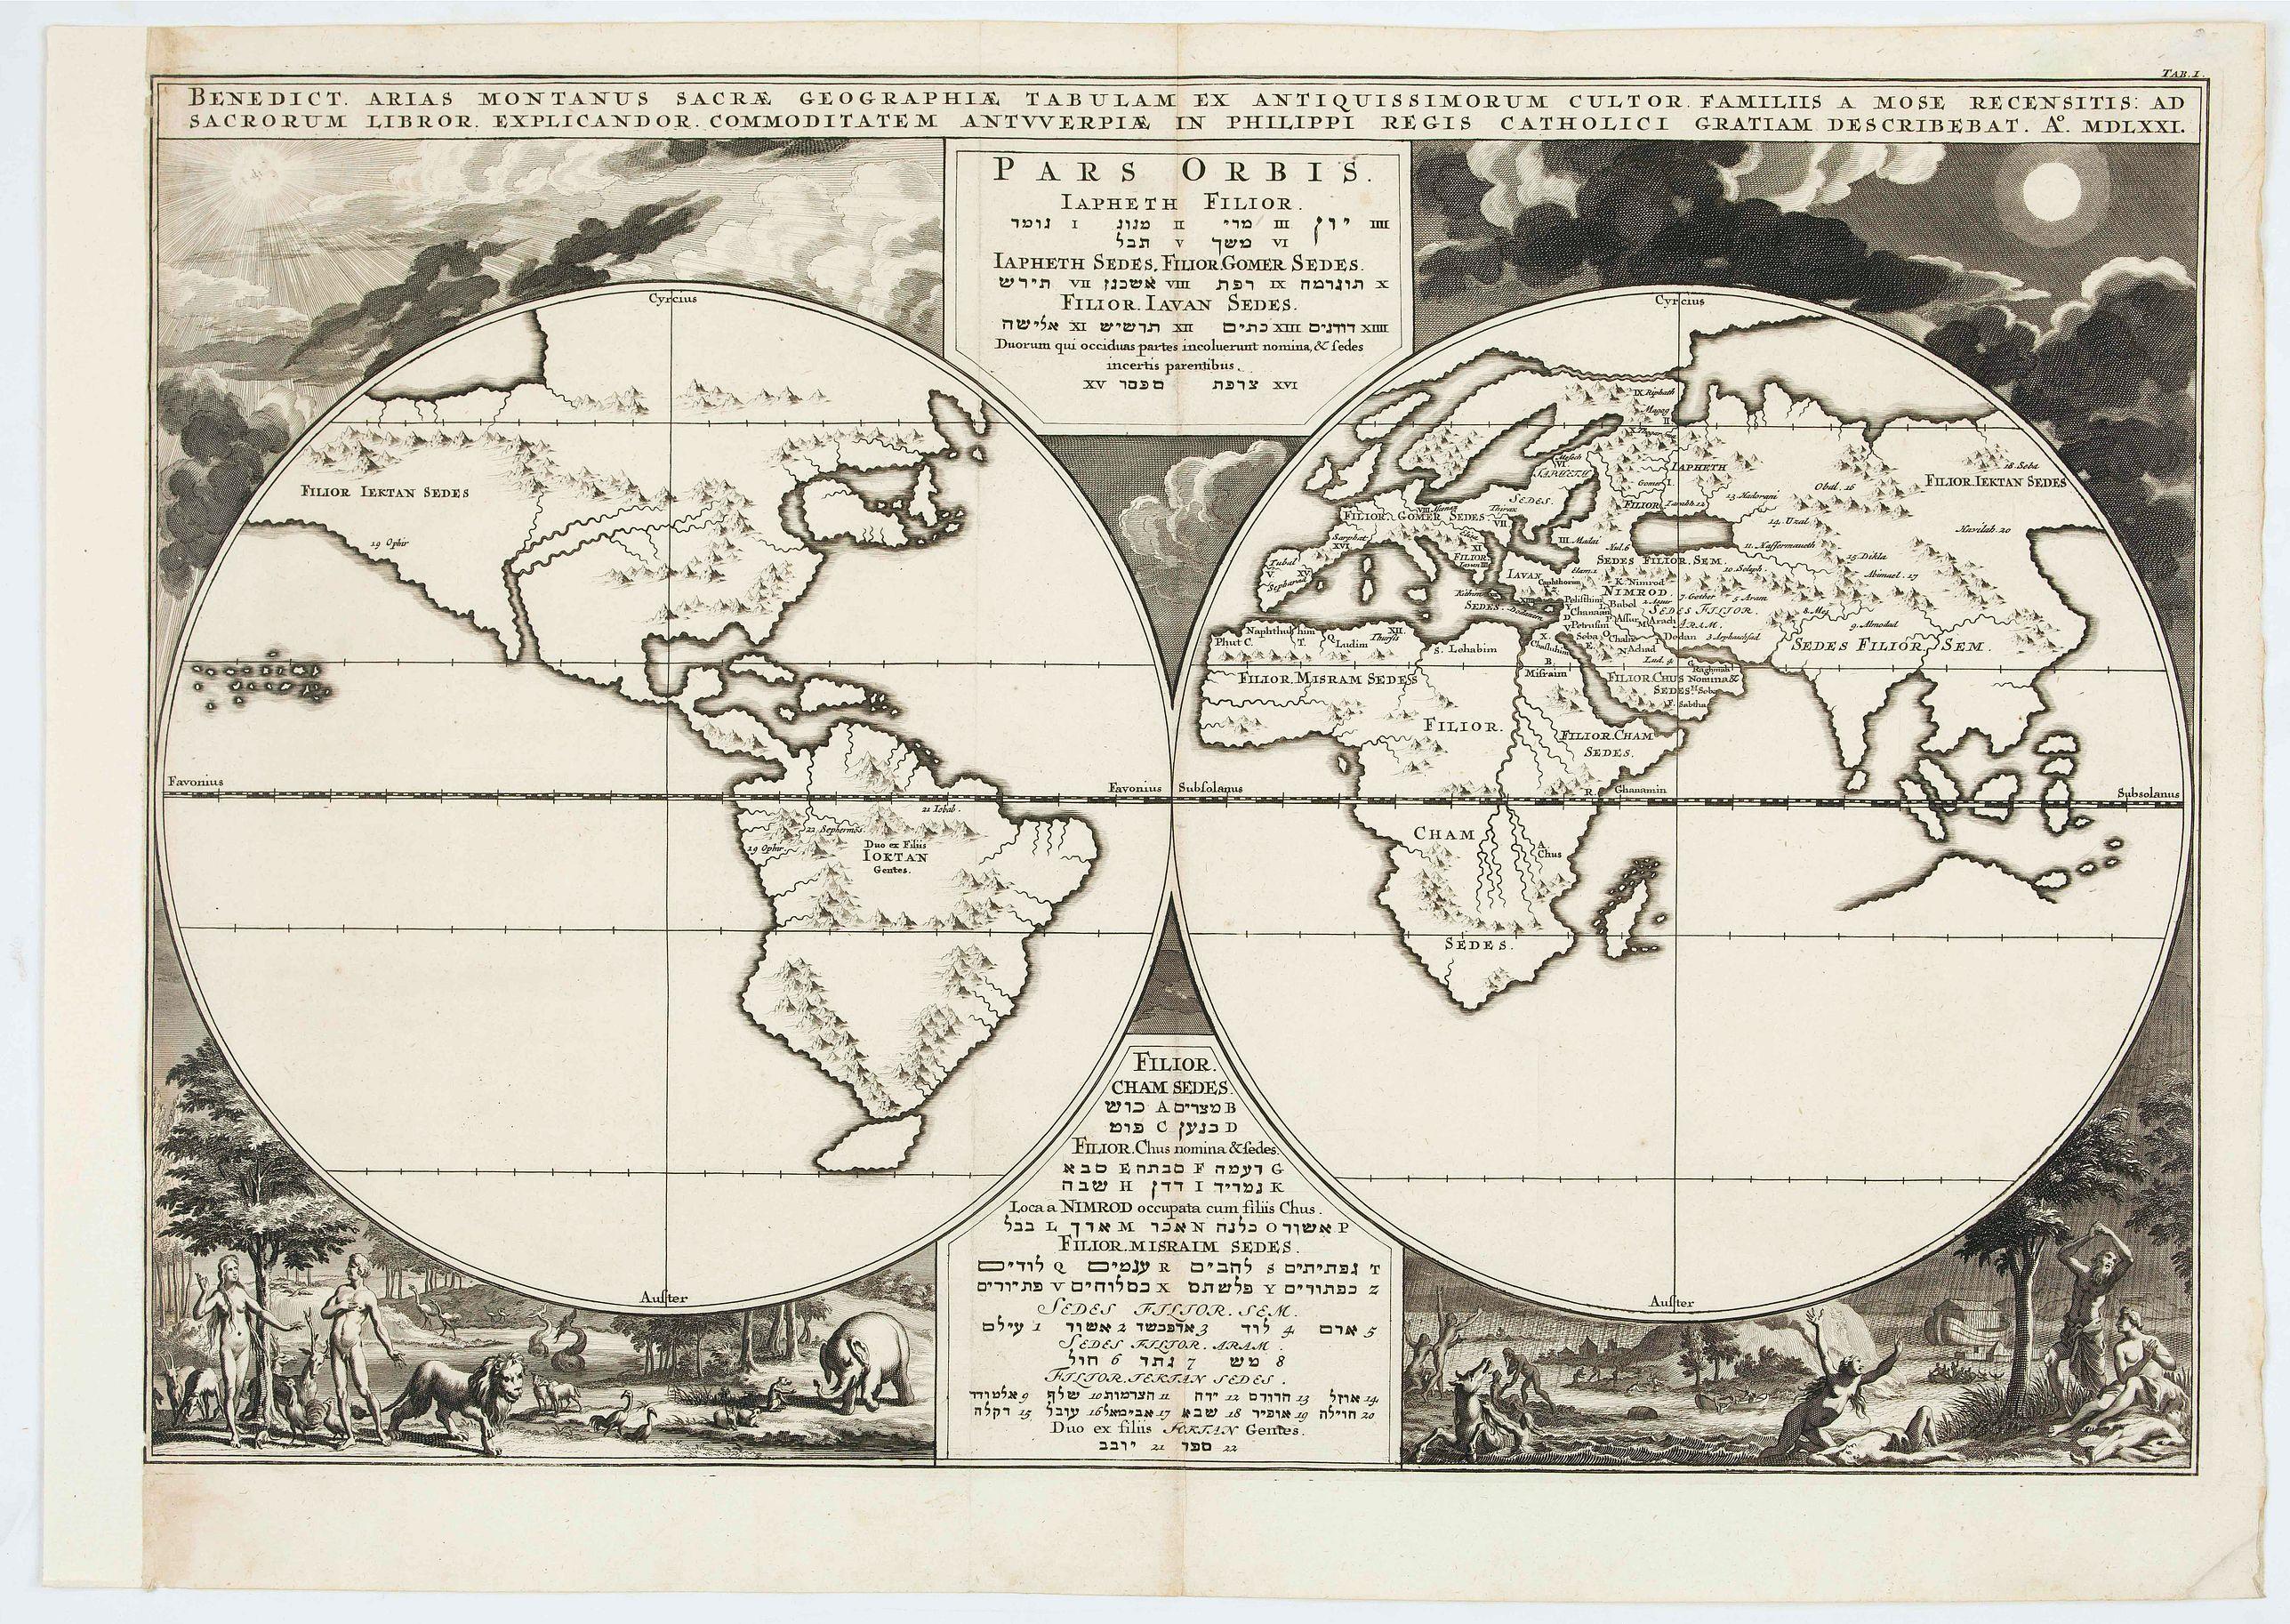 JANSSONIUS VAN WAESBERGHE, J. - Pars Orbis Japheth Filior... Benedict Arias Montanus sacrae geographia Tabulam.